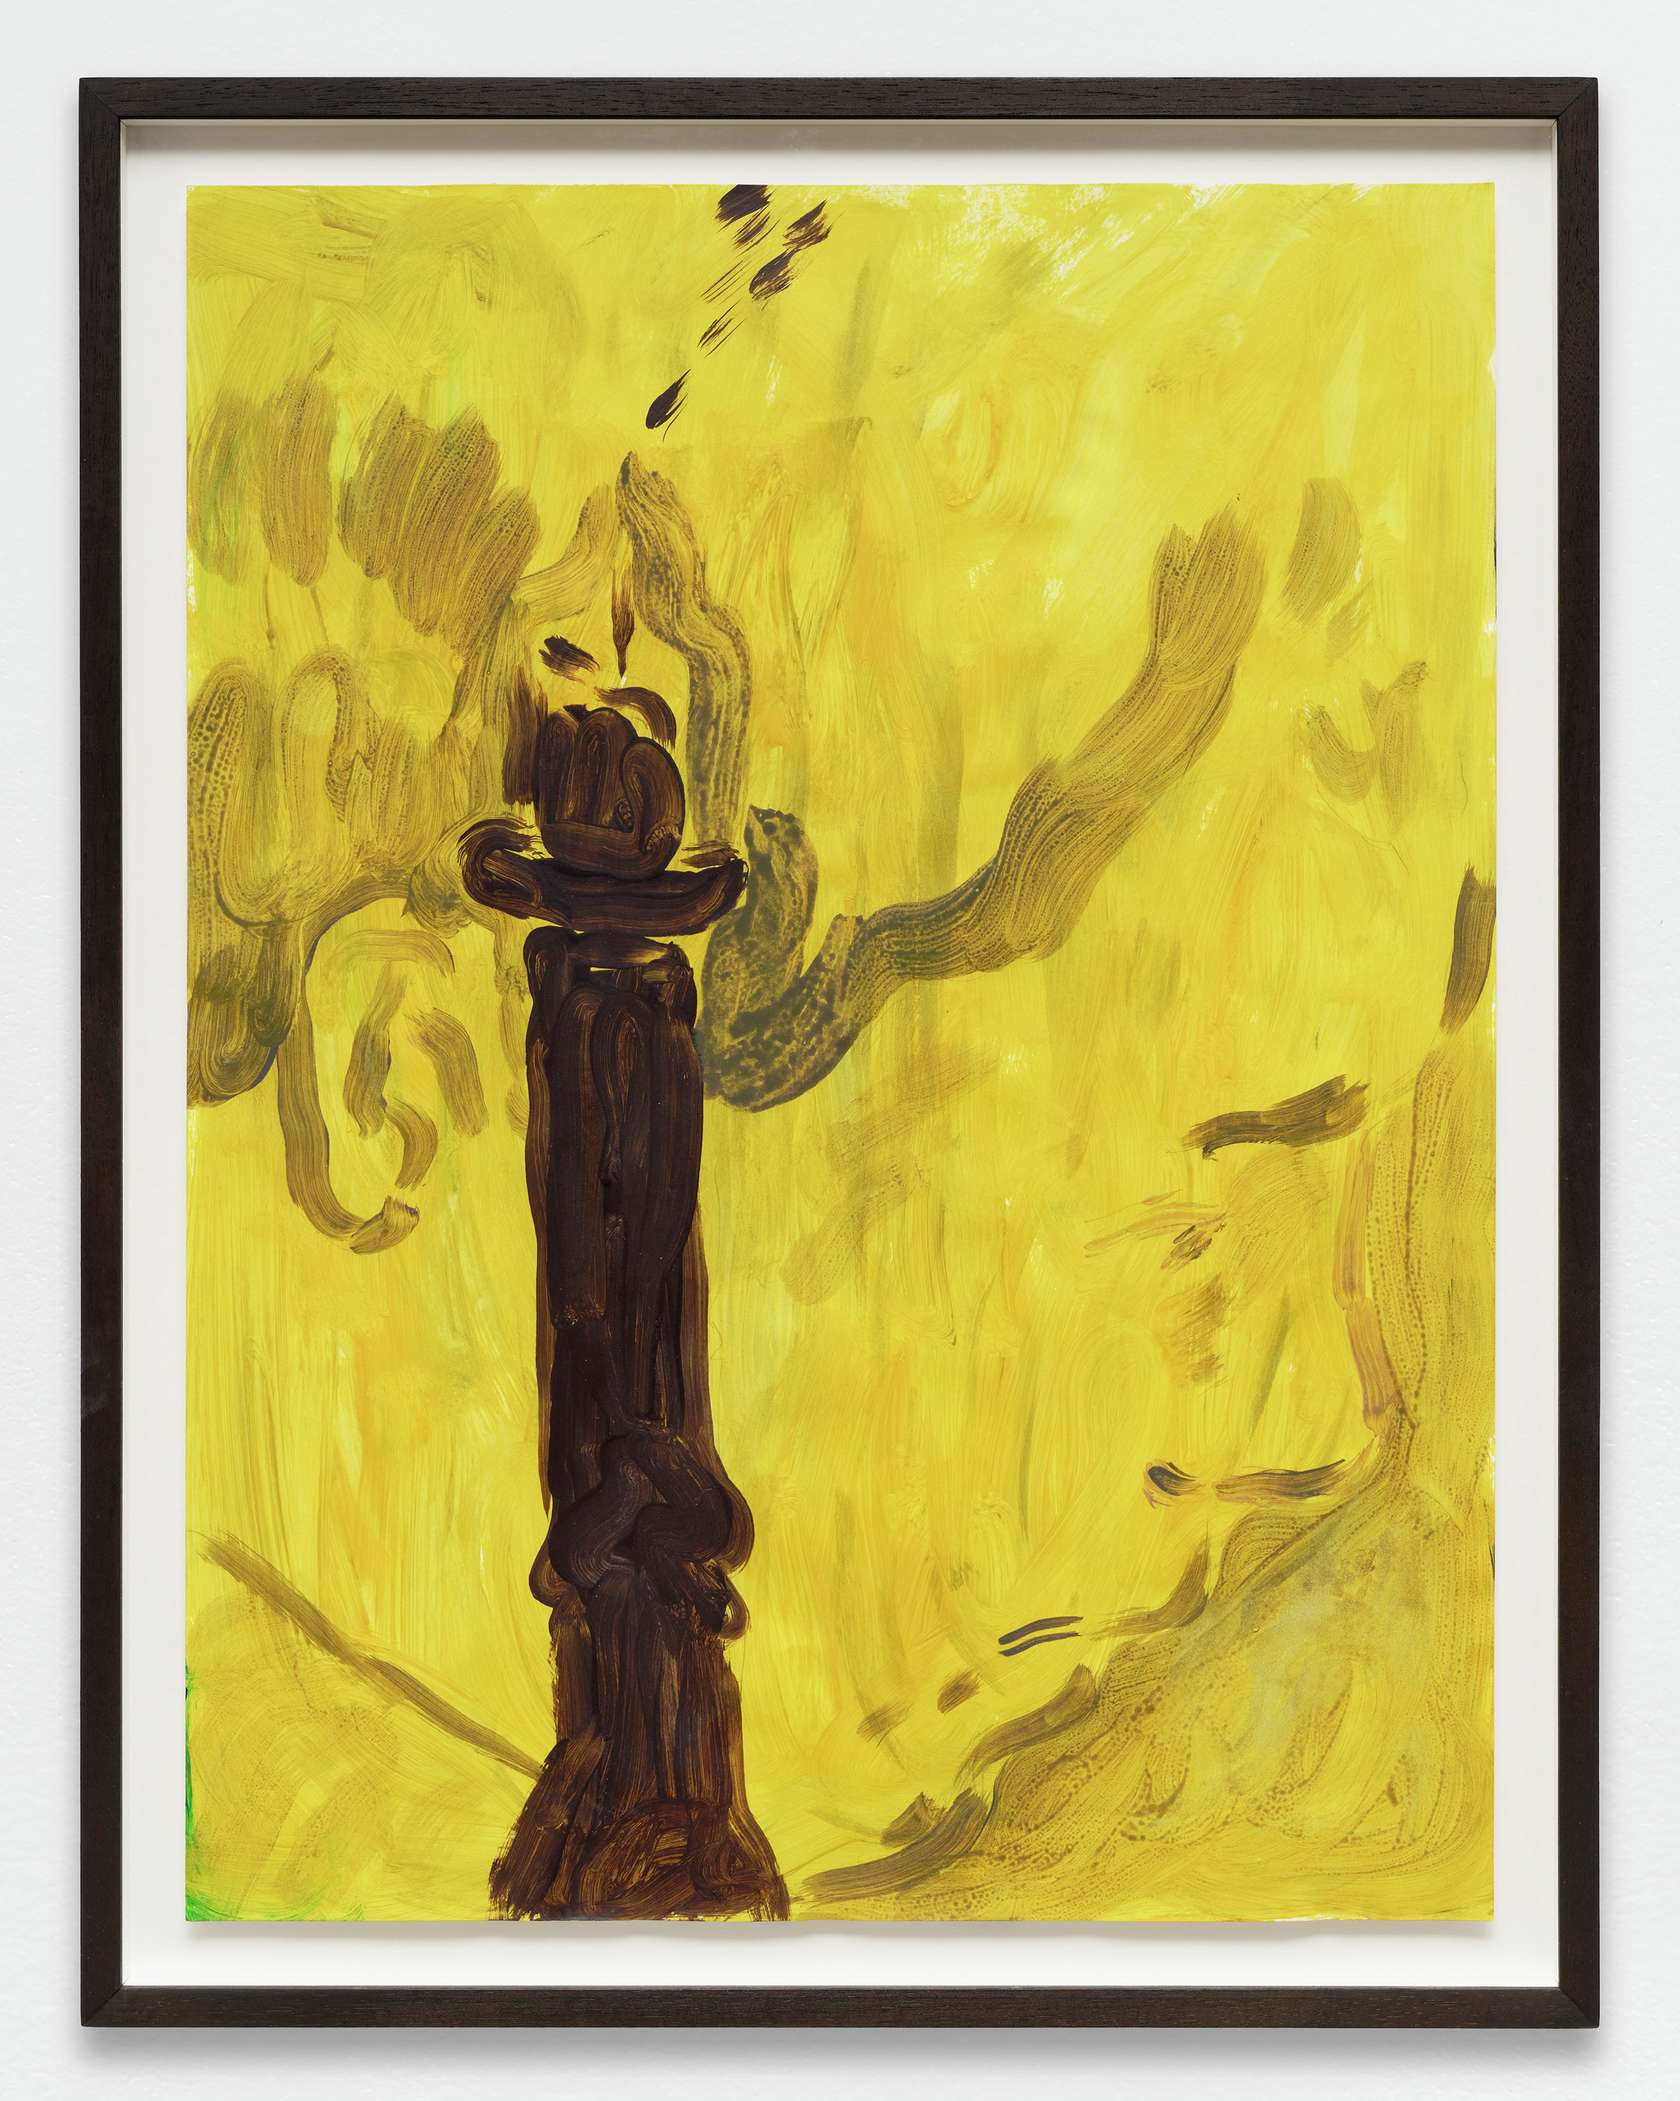 Anthony Cudahy, Flame, 2019 Acrylique sur papier61 × 46 cm / 24  × 18 1/8 in. | 68 × 53 cm / 26 6/8 × 20 7/8 in. (encadré/framed)